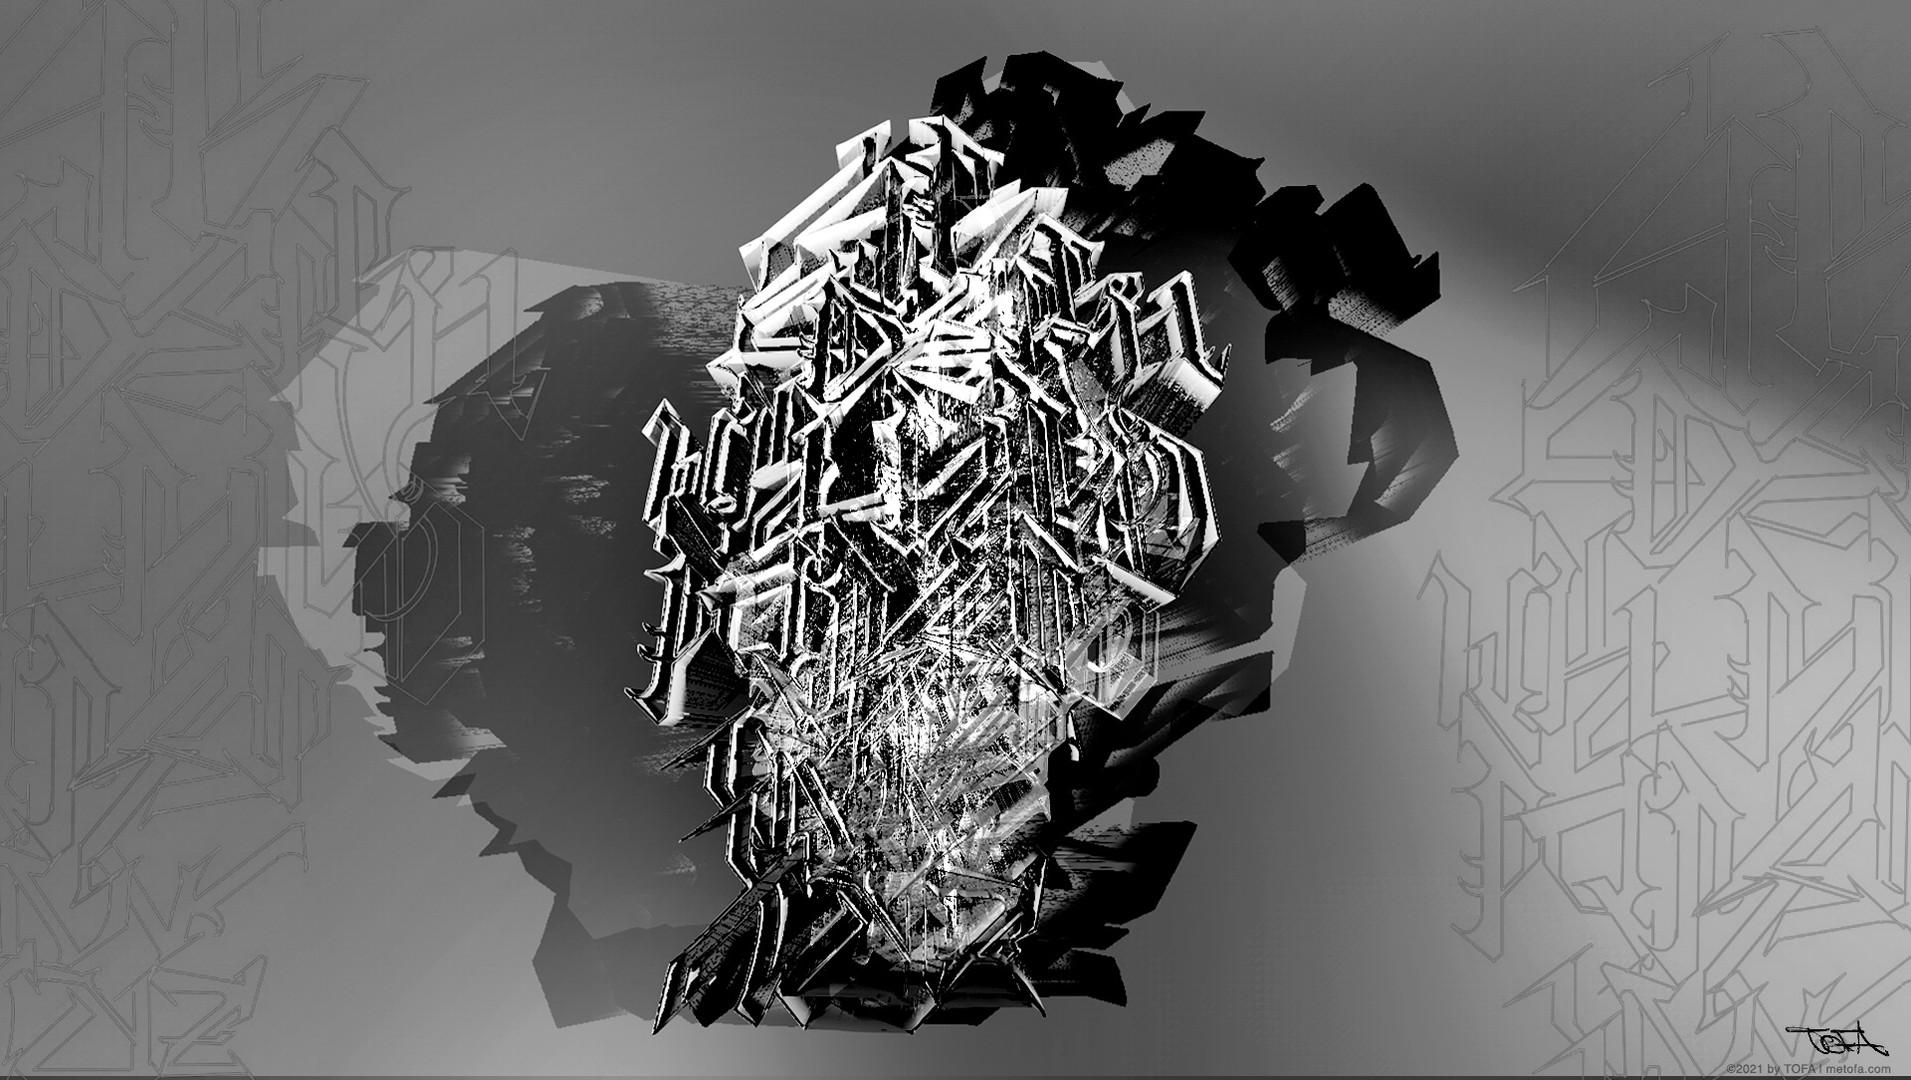 ABC-styleframe-2-web-by-Tofa.jpg